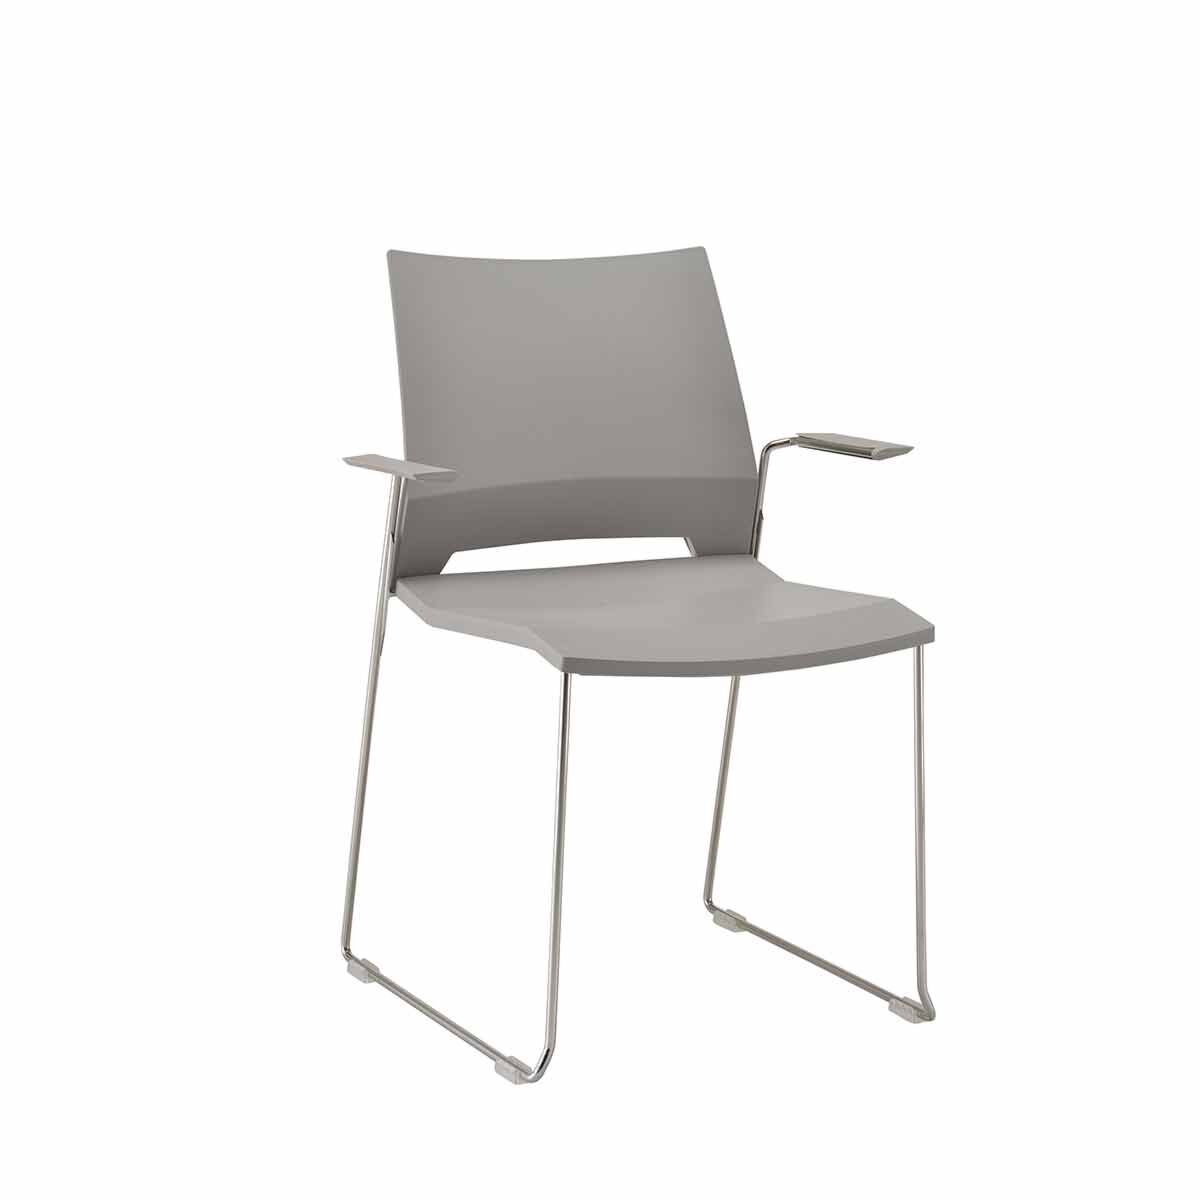 TC Office Rome Skid Armchair Grey